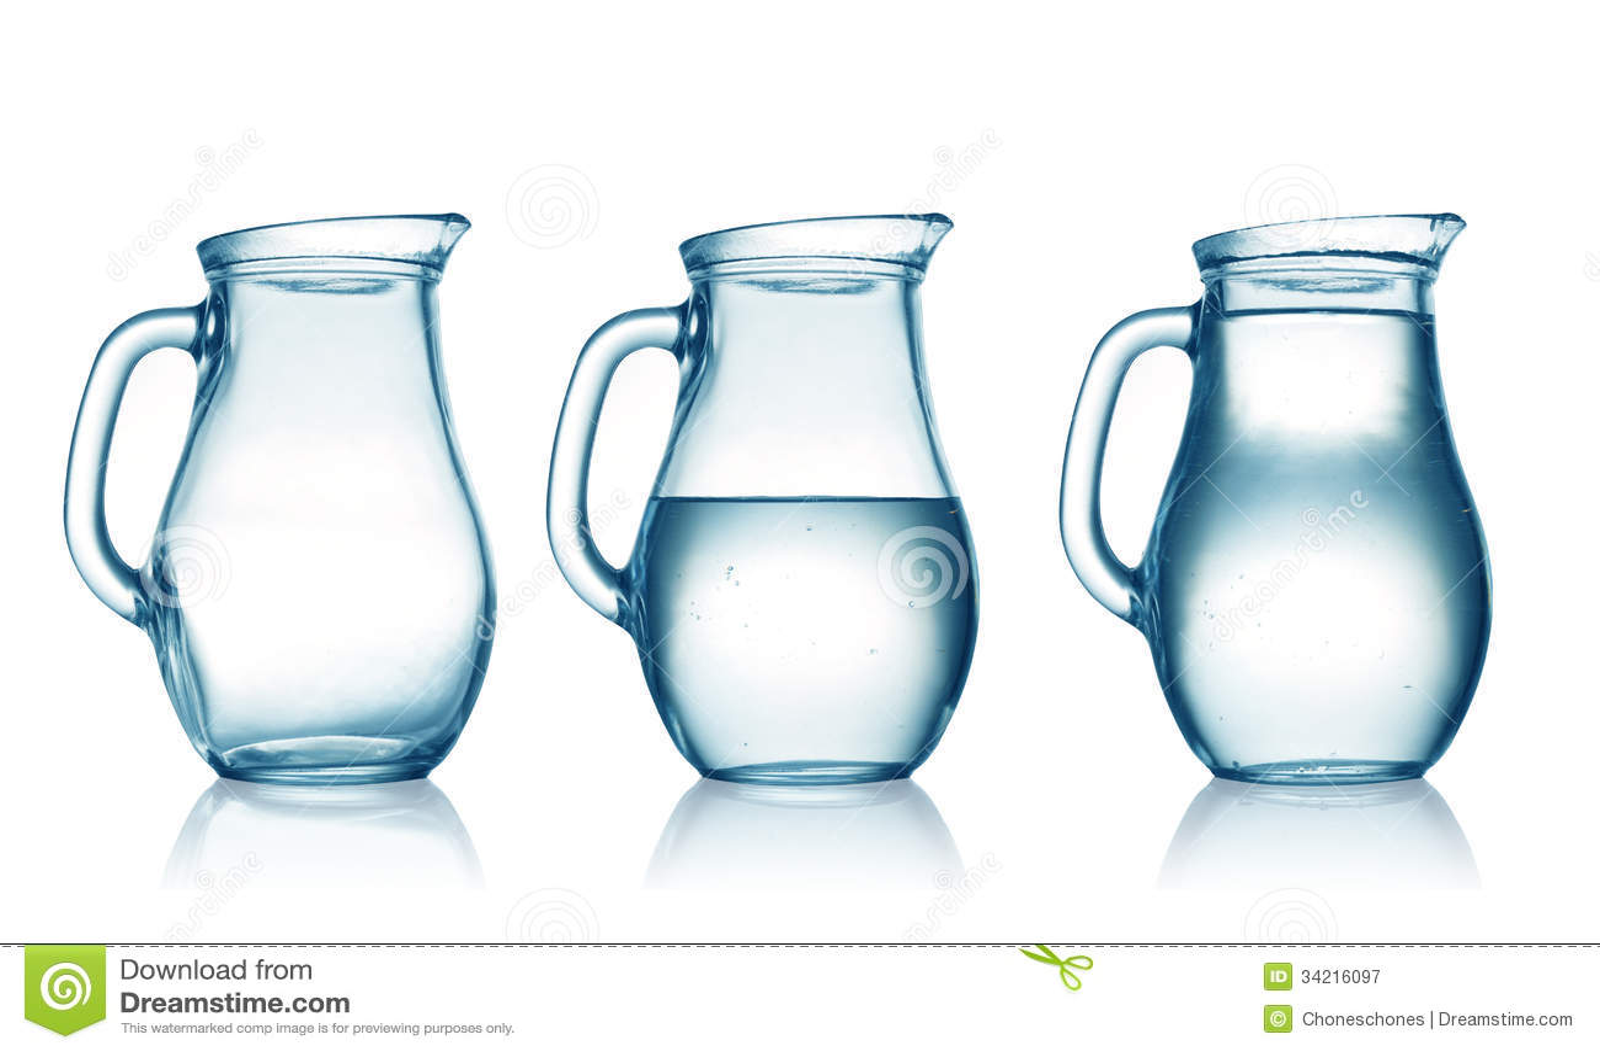 Free Clipart Glass Half Full